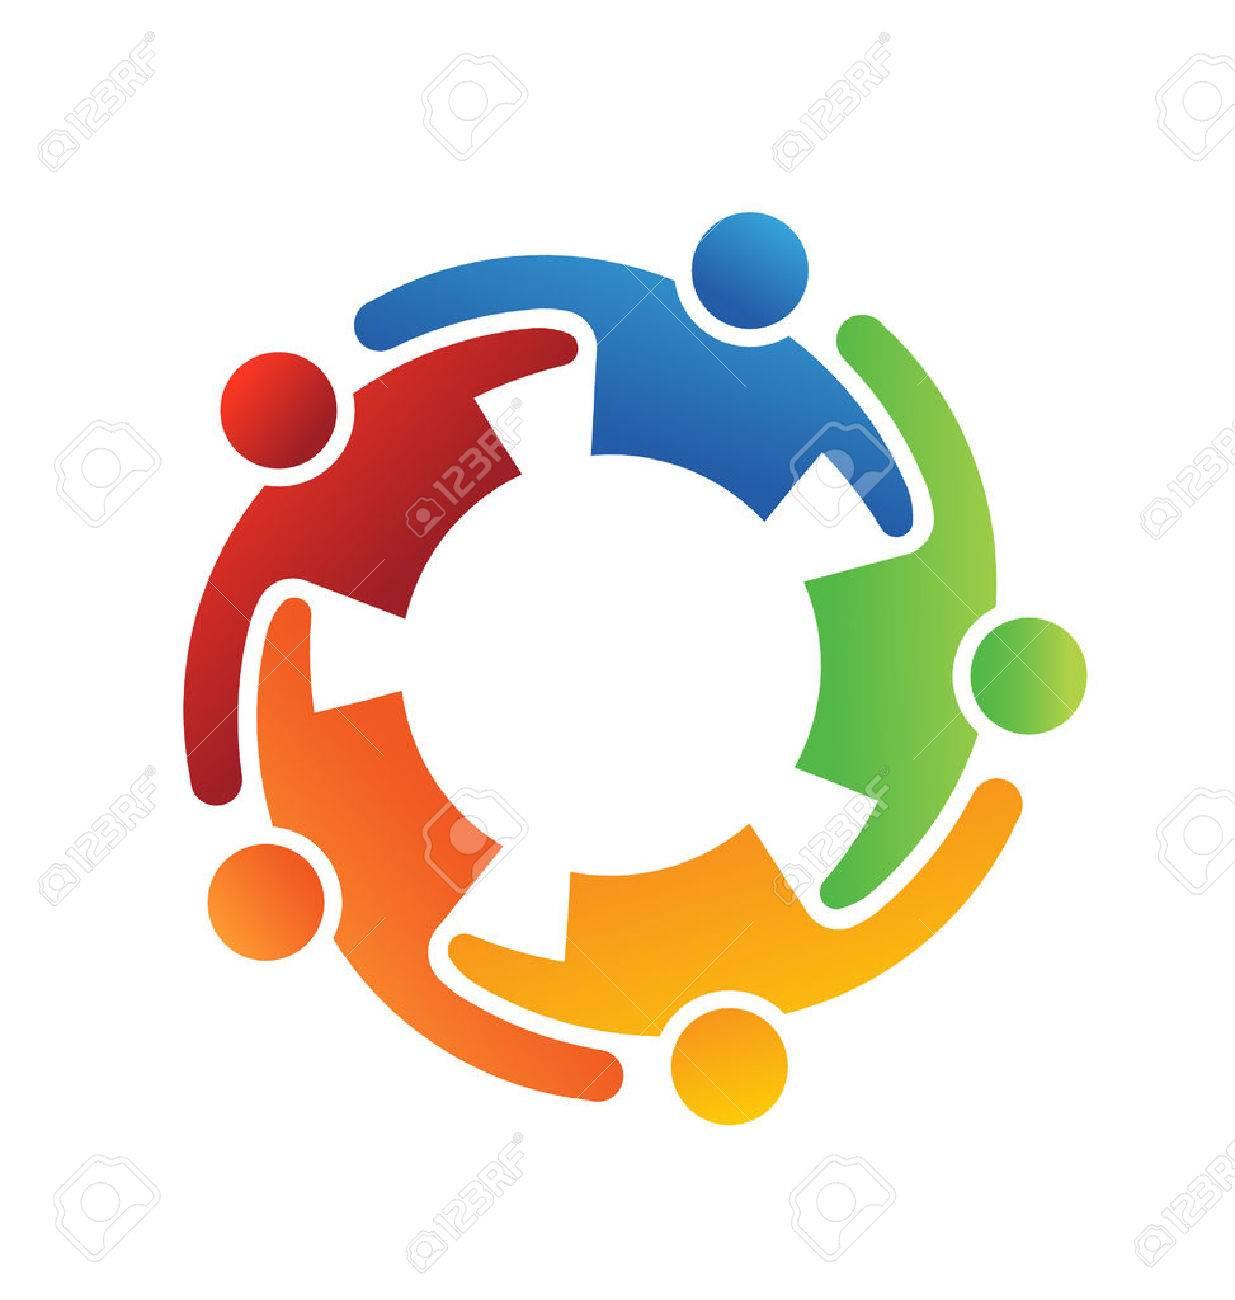 Teamwork Embrace 5 - 23962162